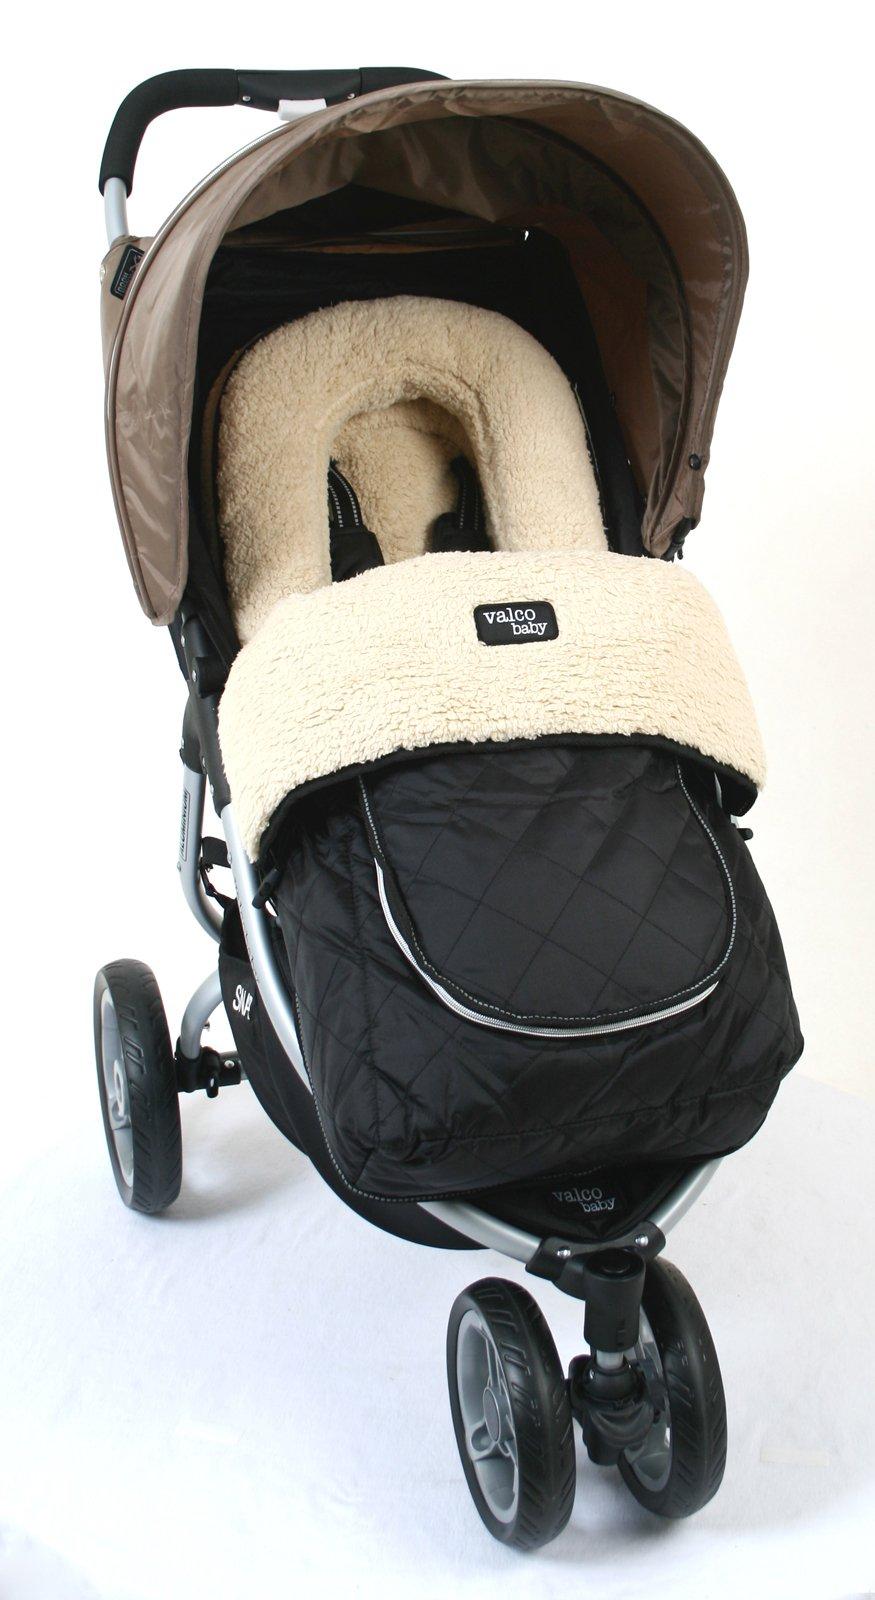 Valco Baby Universal Deluxe Fleece Foot Muff (Fluffly Fleece) by valco baby (Image #2)